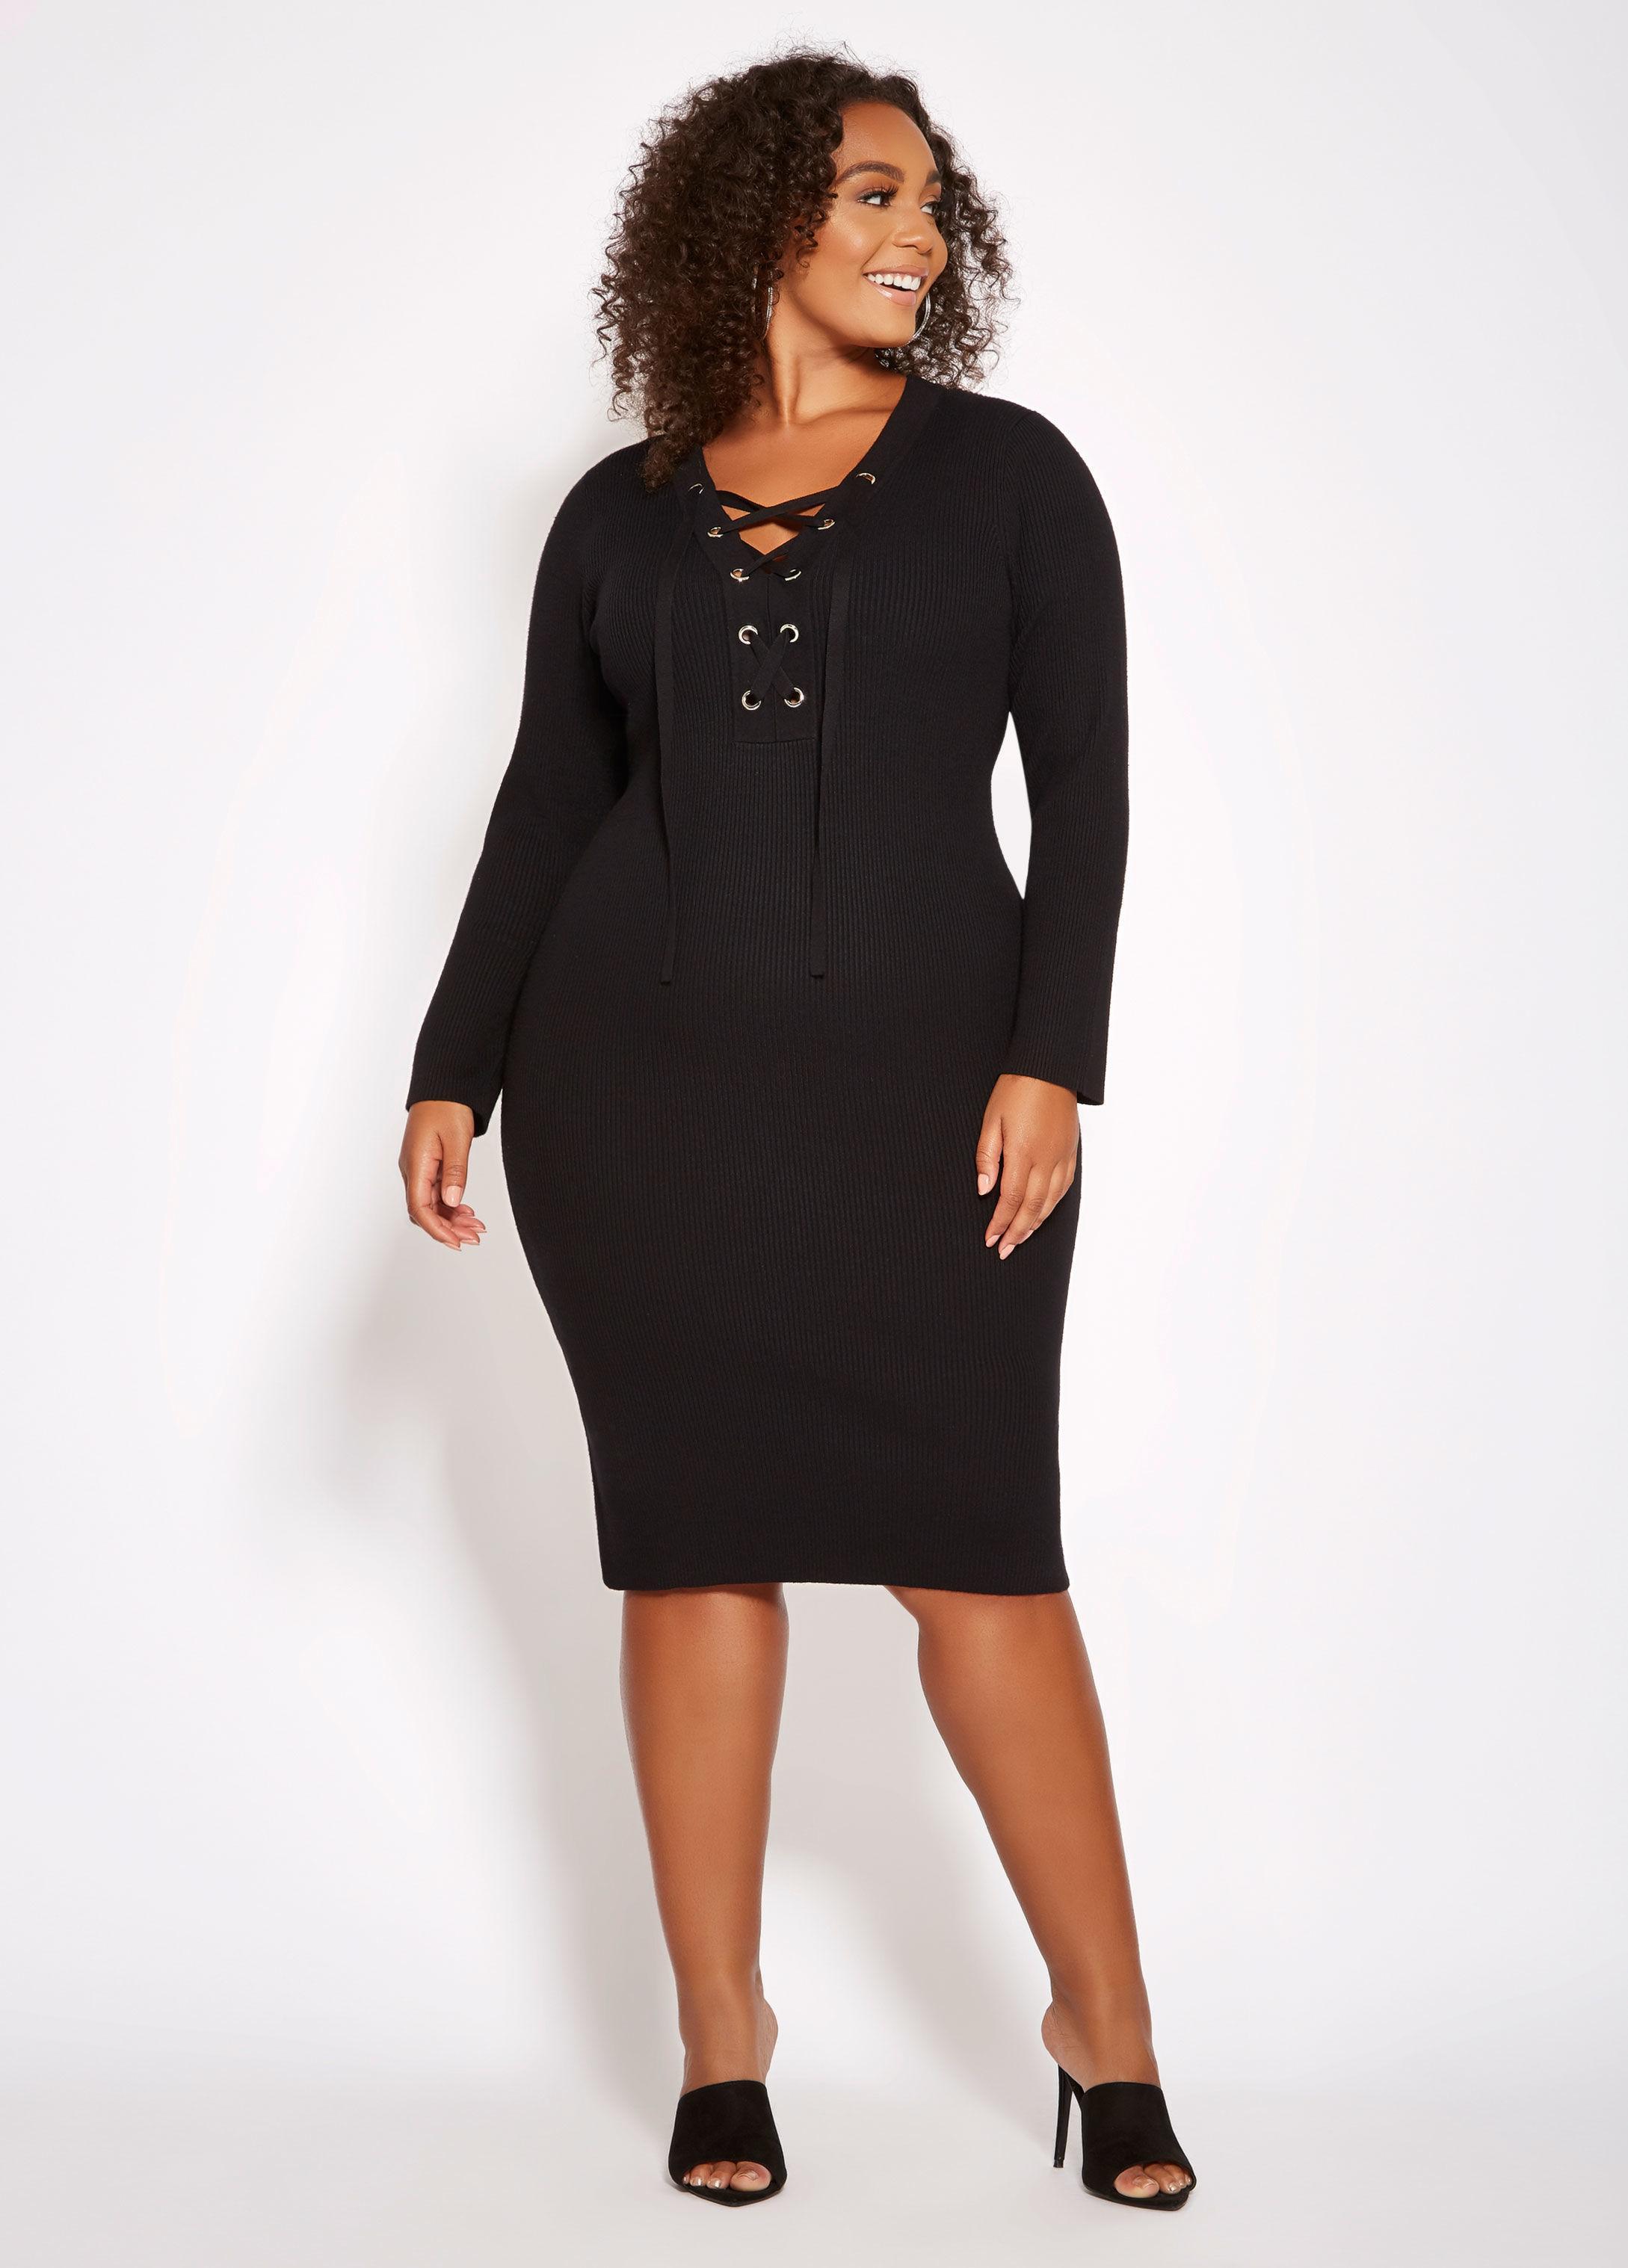 aa9edb8c292 Lyst - Ashley Stewart Plus Size Lace Up Ribbed Sweater Dress in Black